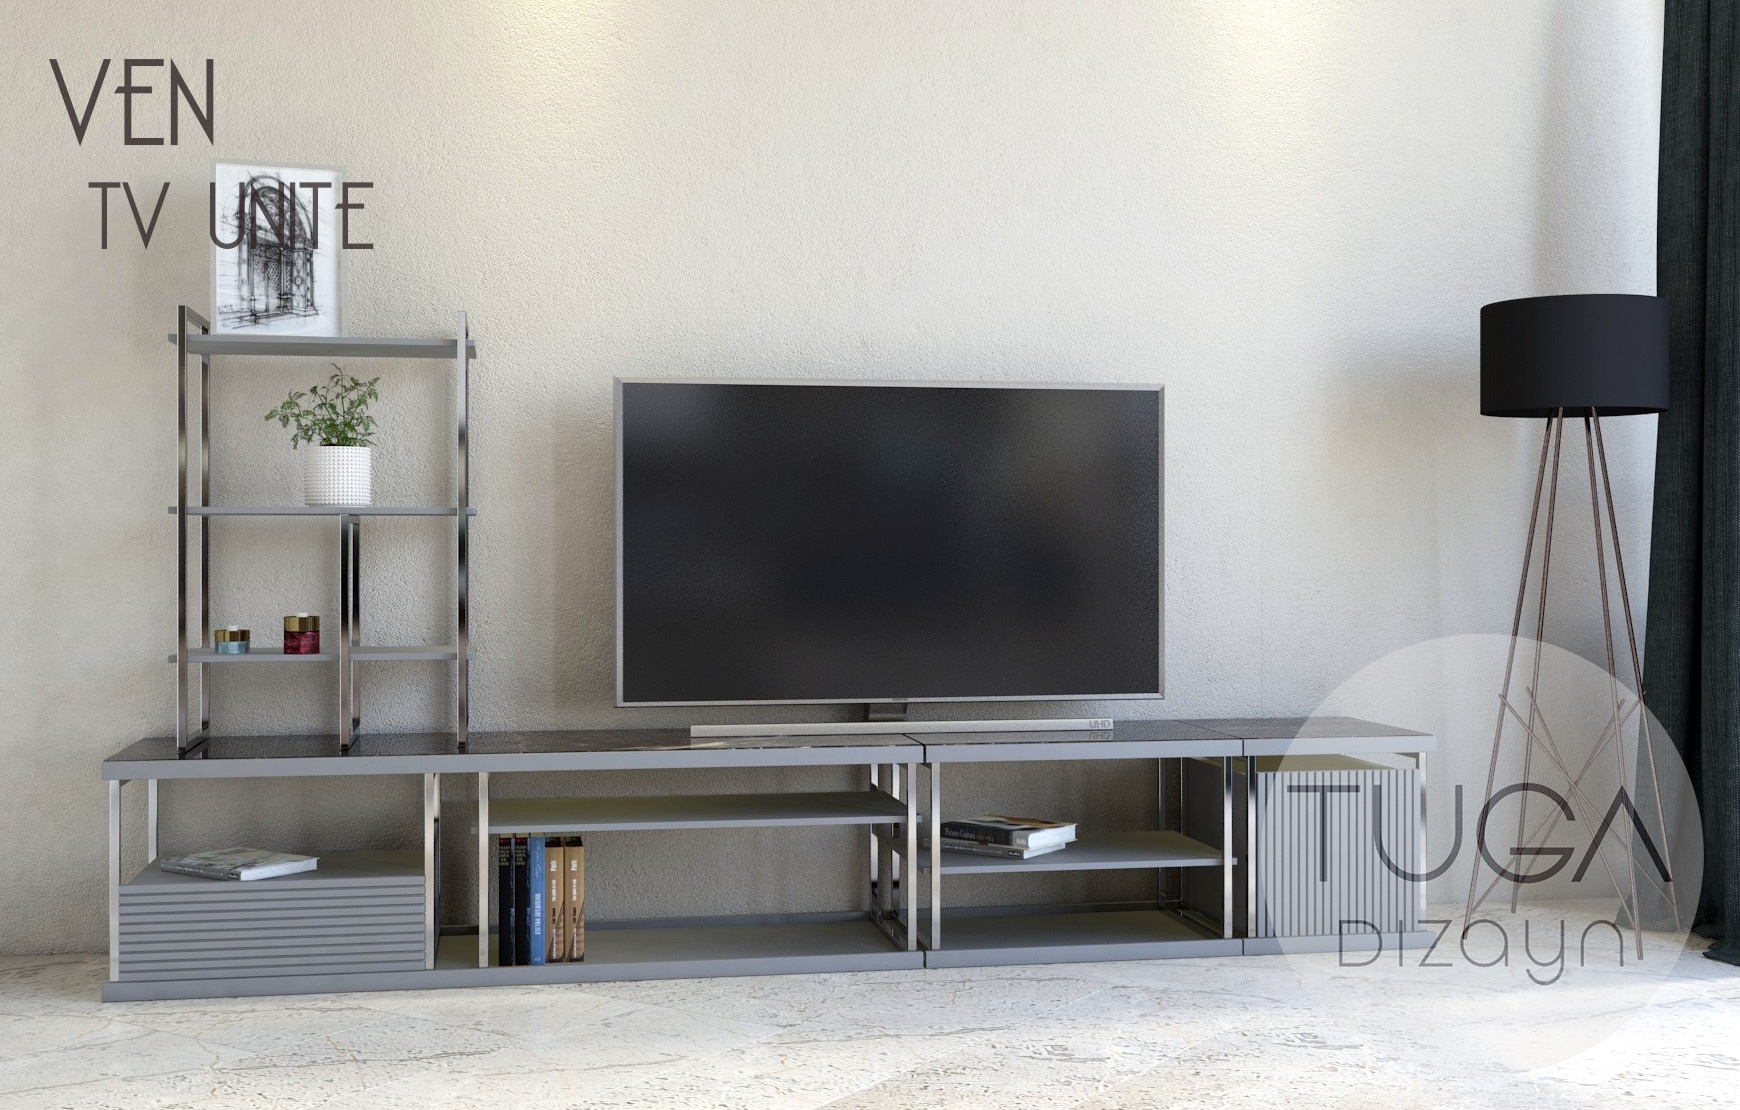 Ven Tv Ünitesi Model 1